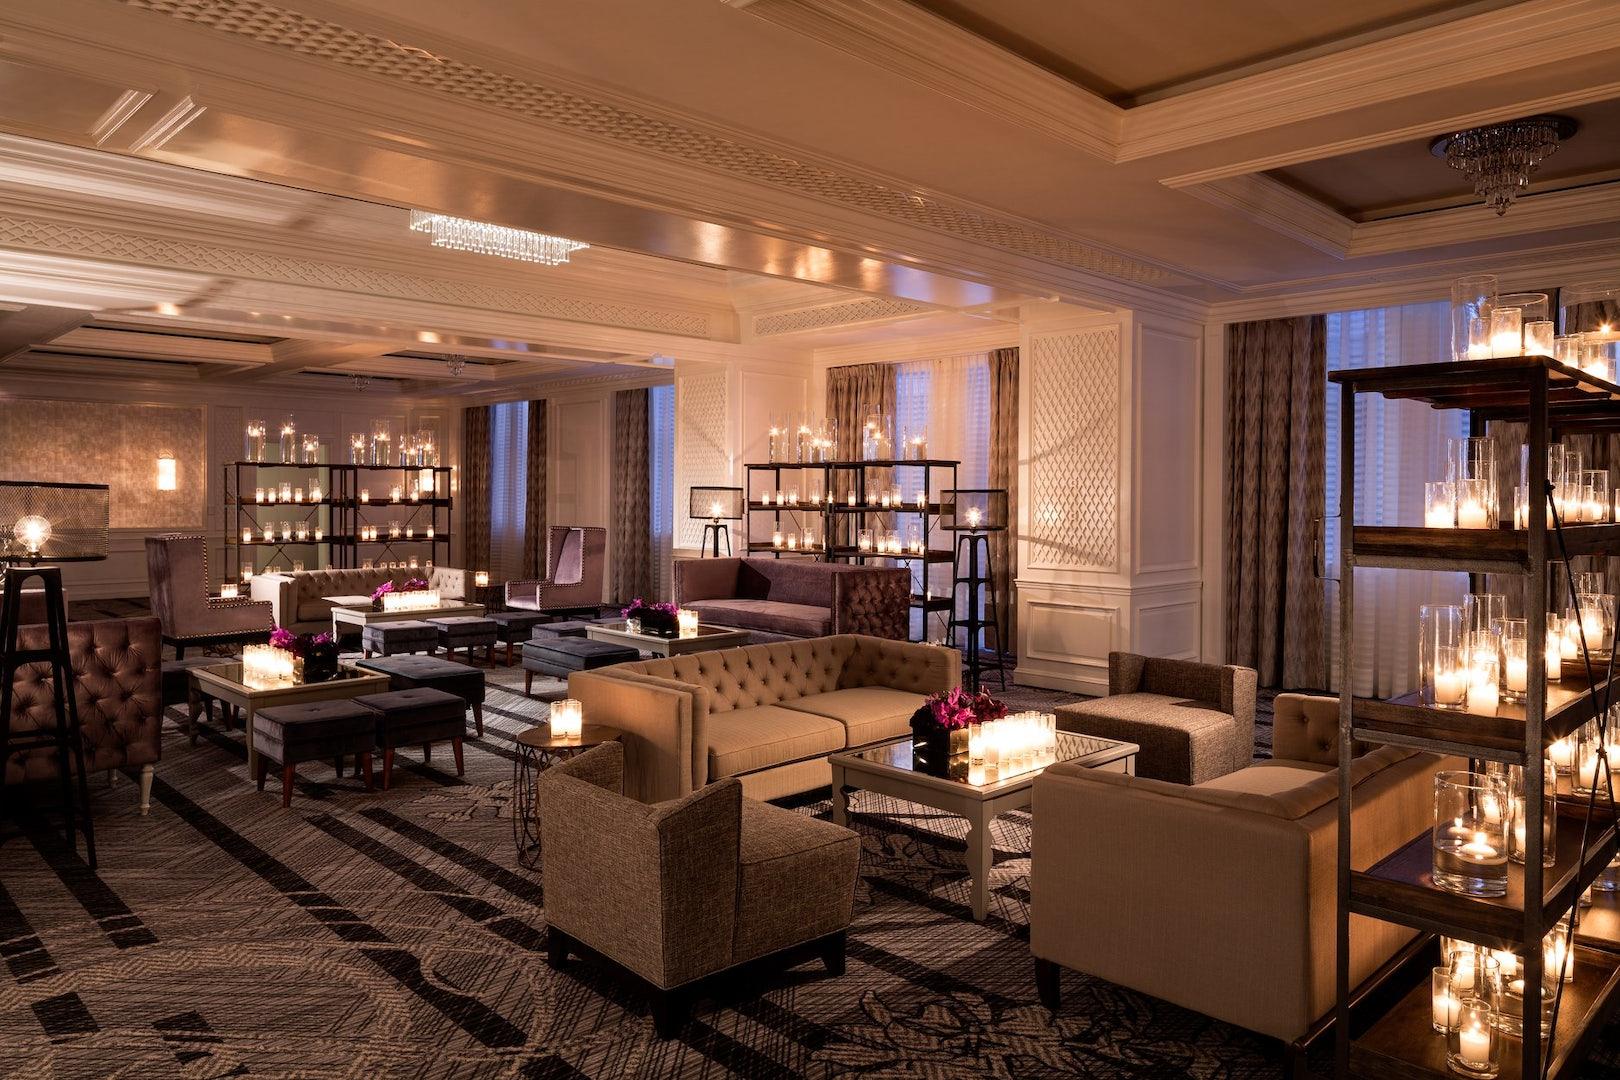 interior of the Ritz Carlton in San Francisco